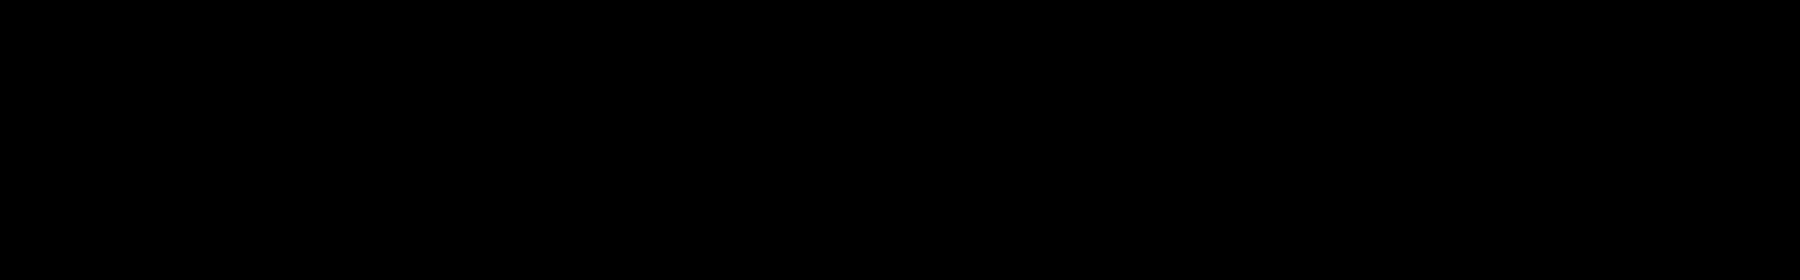 HighLife Samples Sylenth 1 Vocal Presets audio waveform